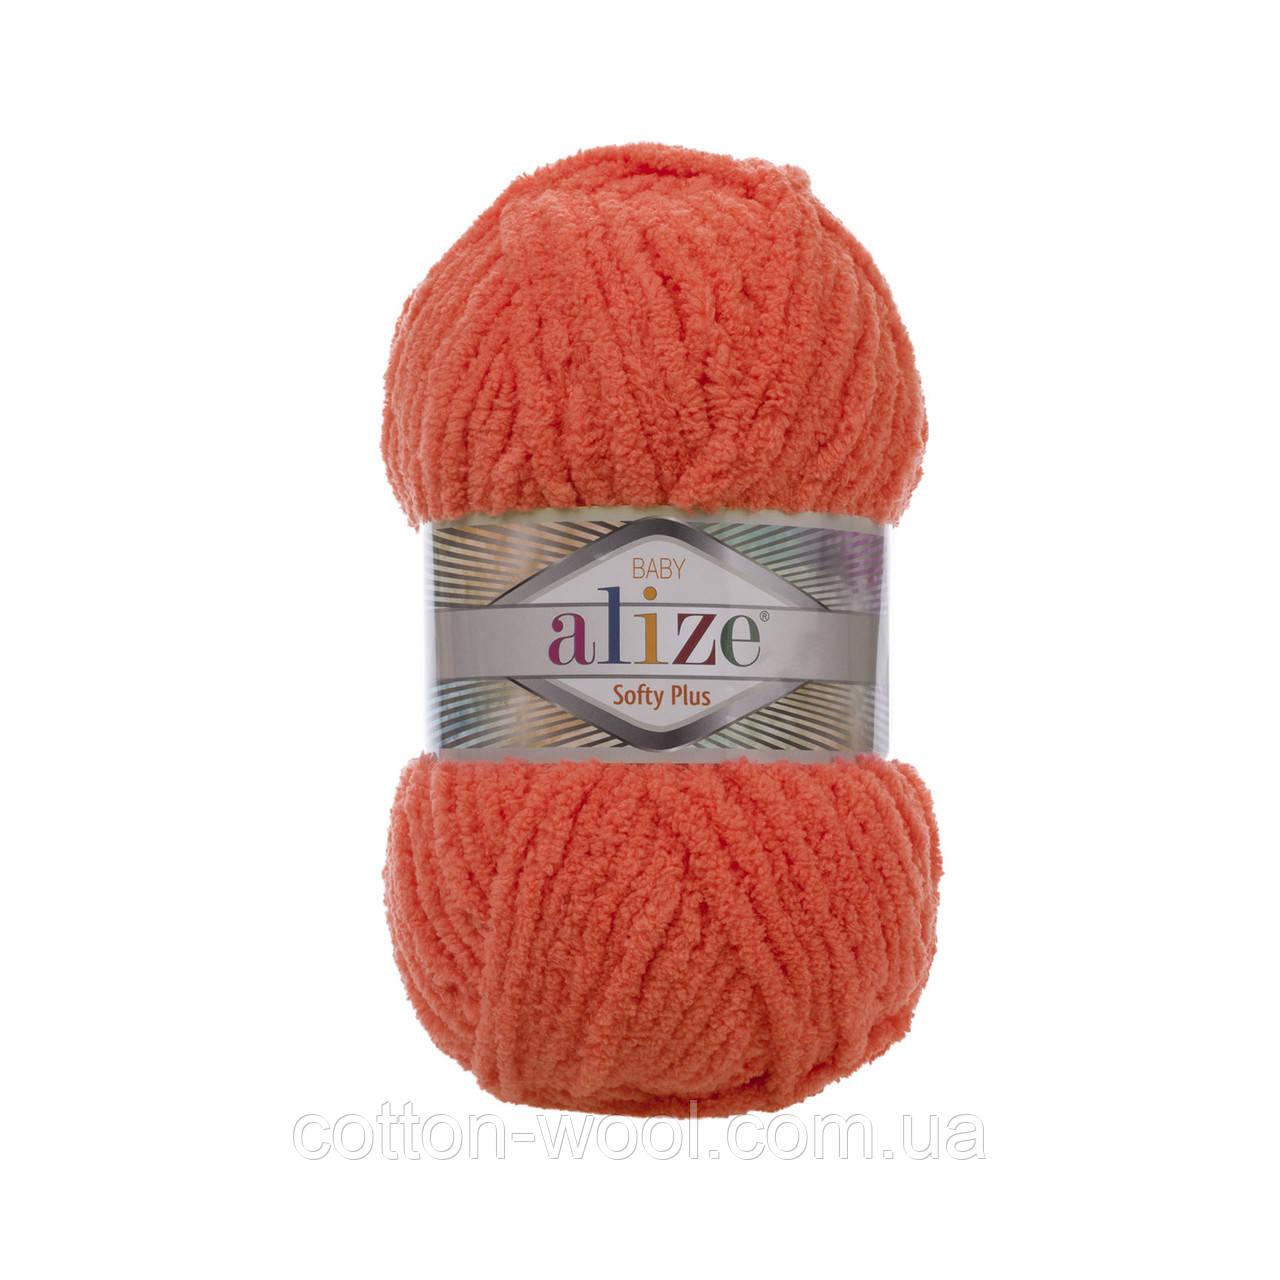 Softy Plus (Софти плюс) 100% - микрополиєстер 526